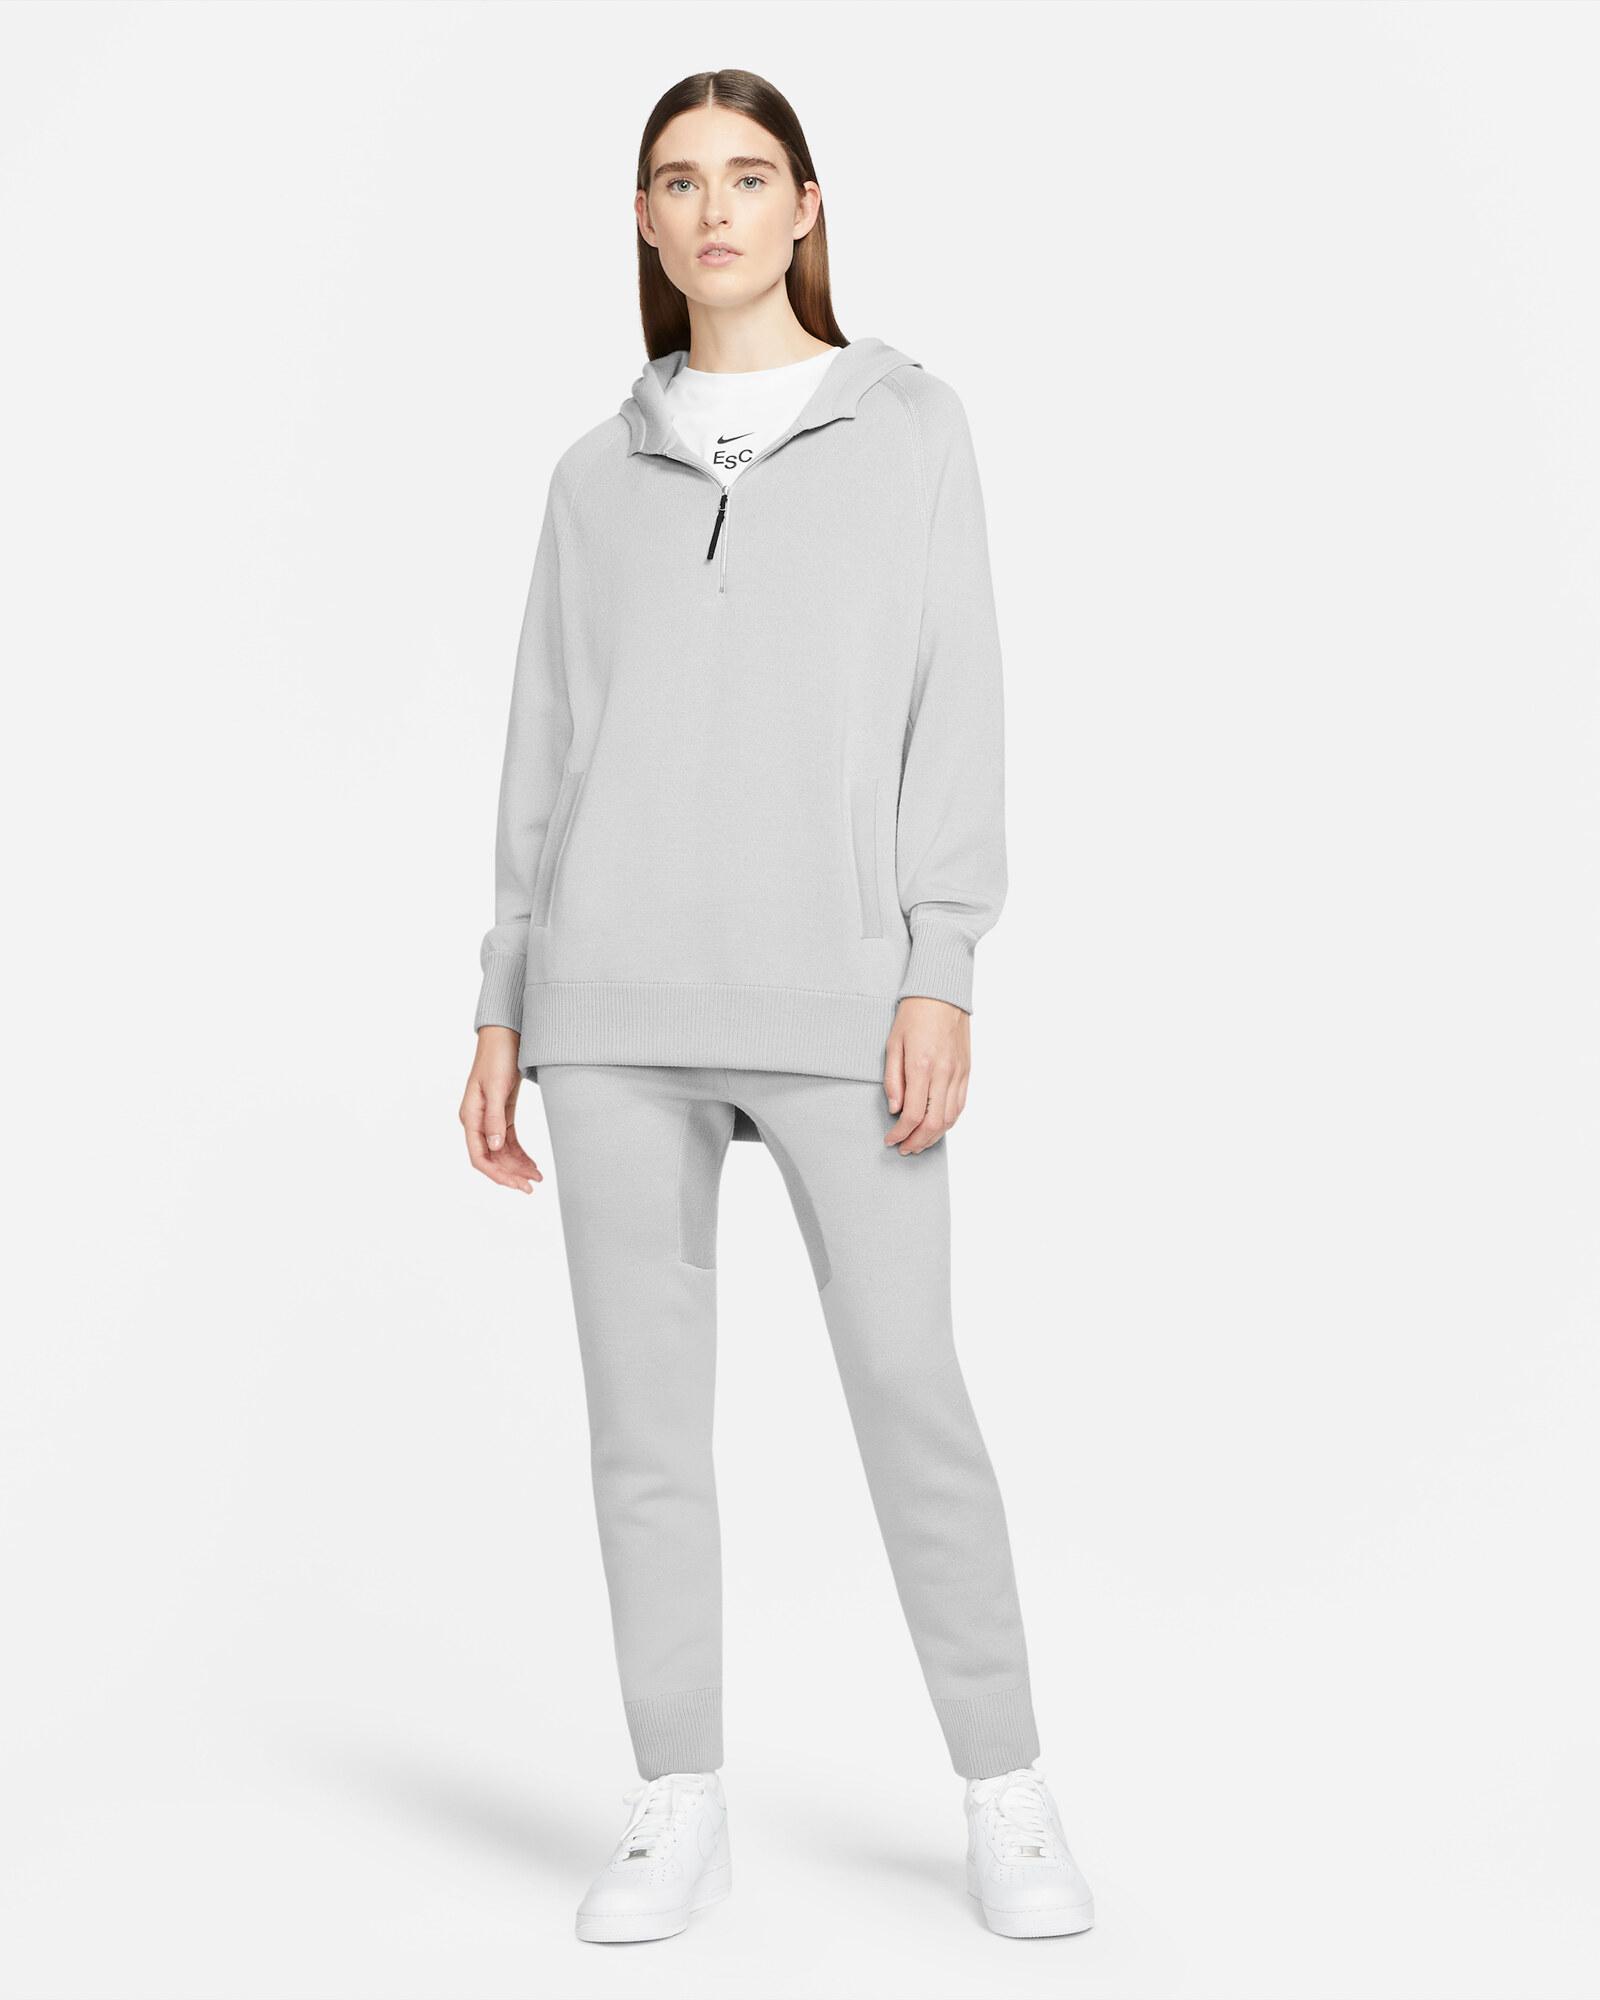 Nike u201cEvery Stitch Consideredu201d